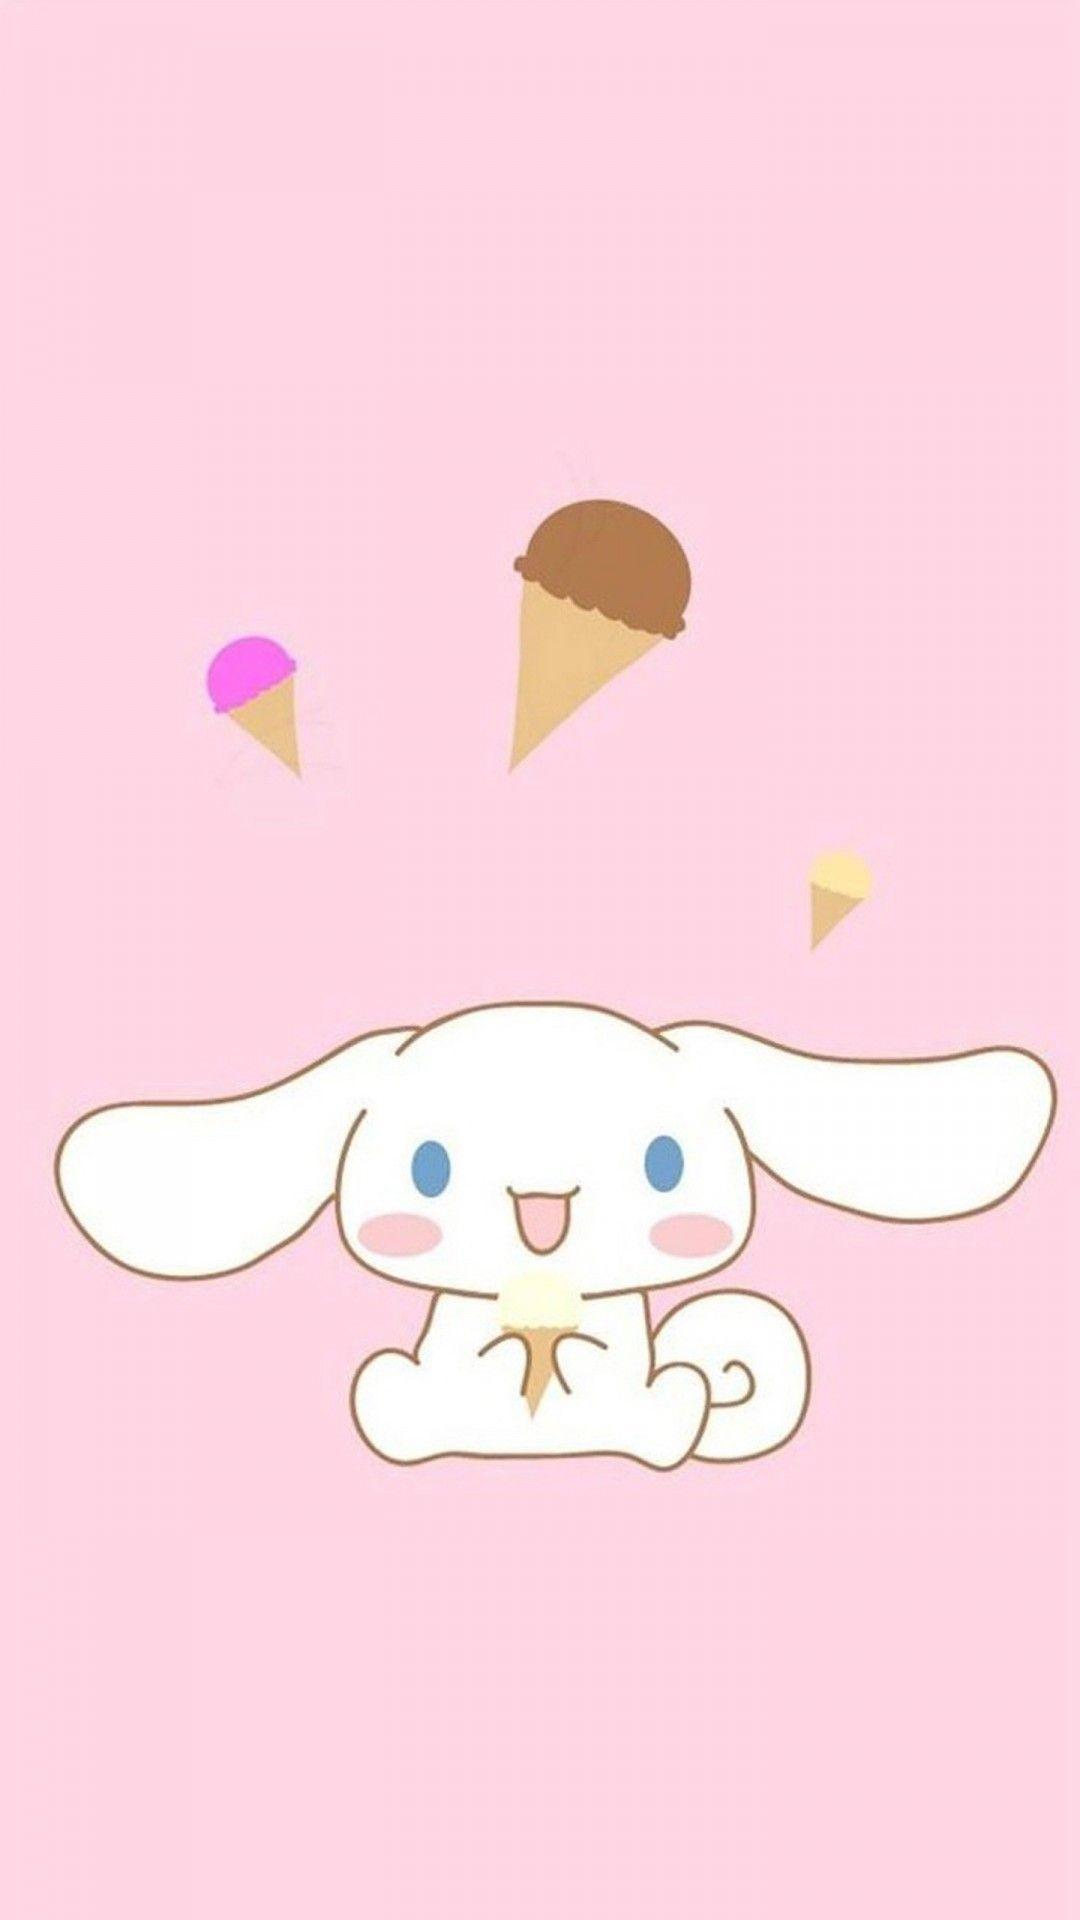 Cute Cartoon Bunny Backgrounds Wallpaper Cave